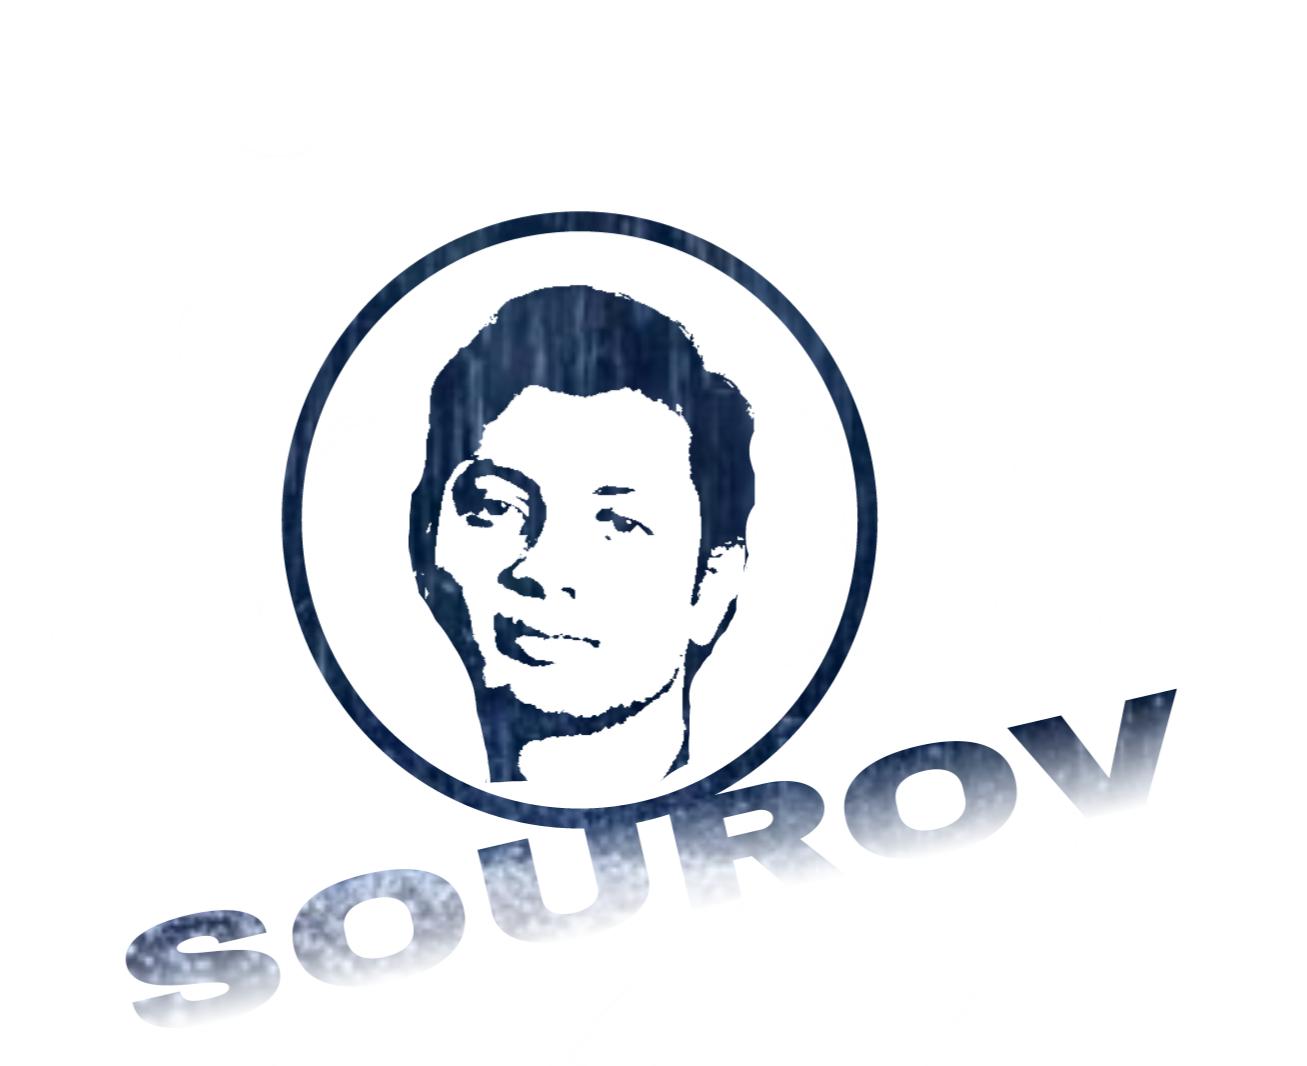 SI Sourov